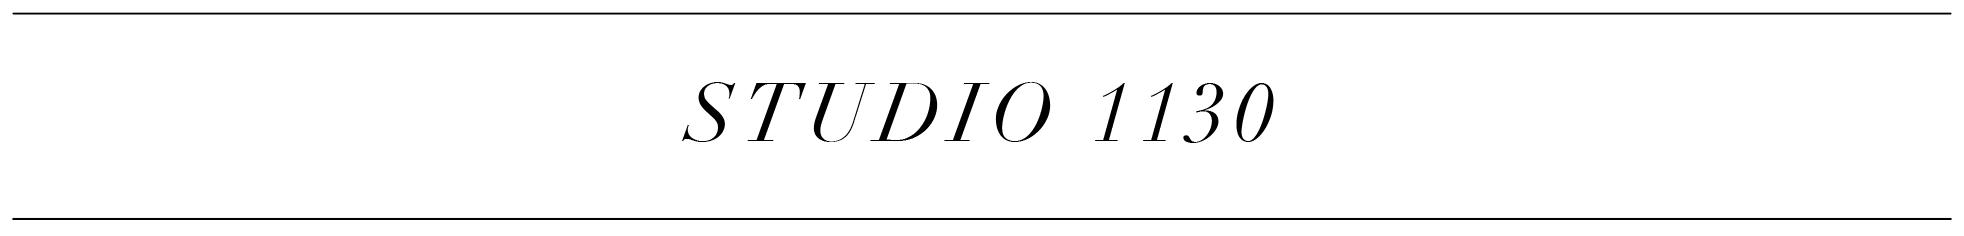 Studio 1130.png